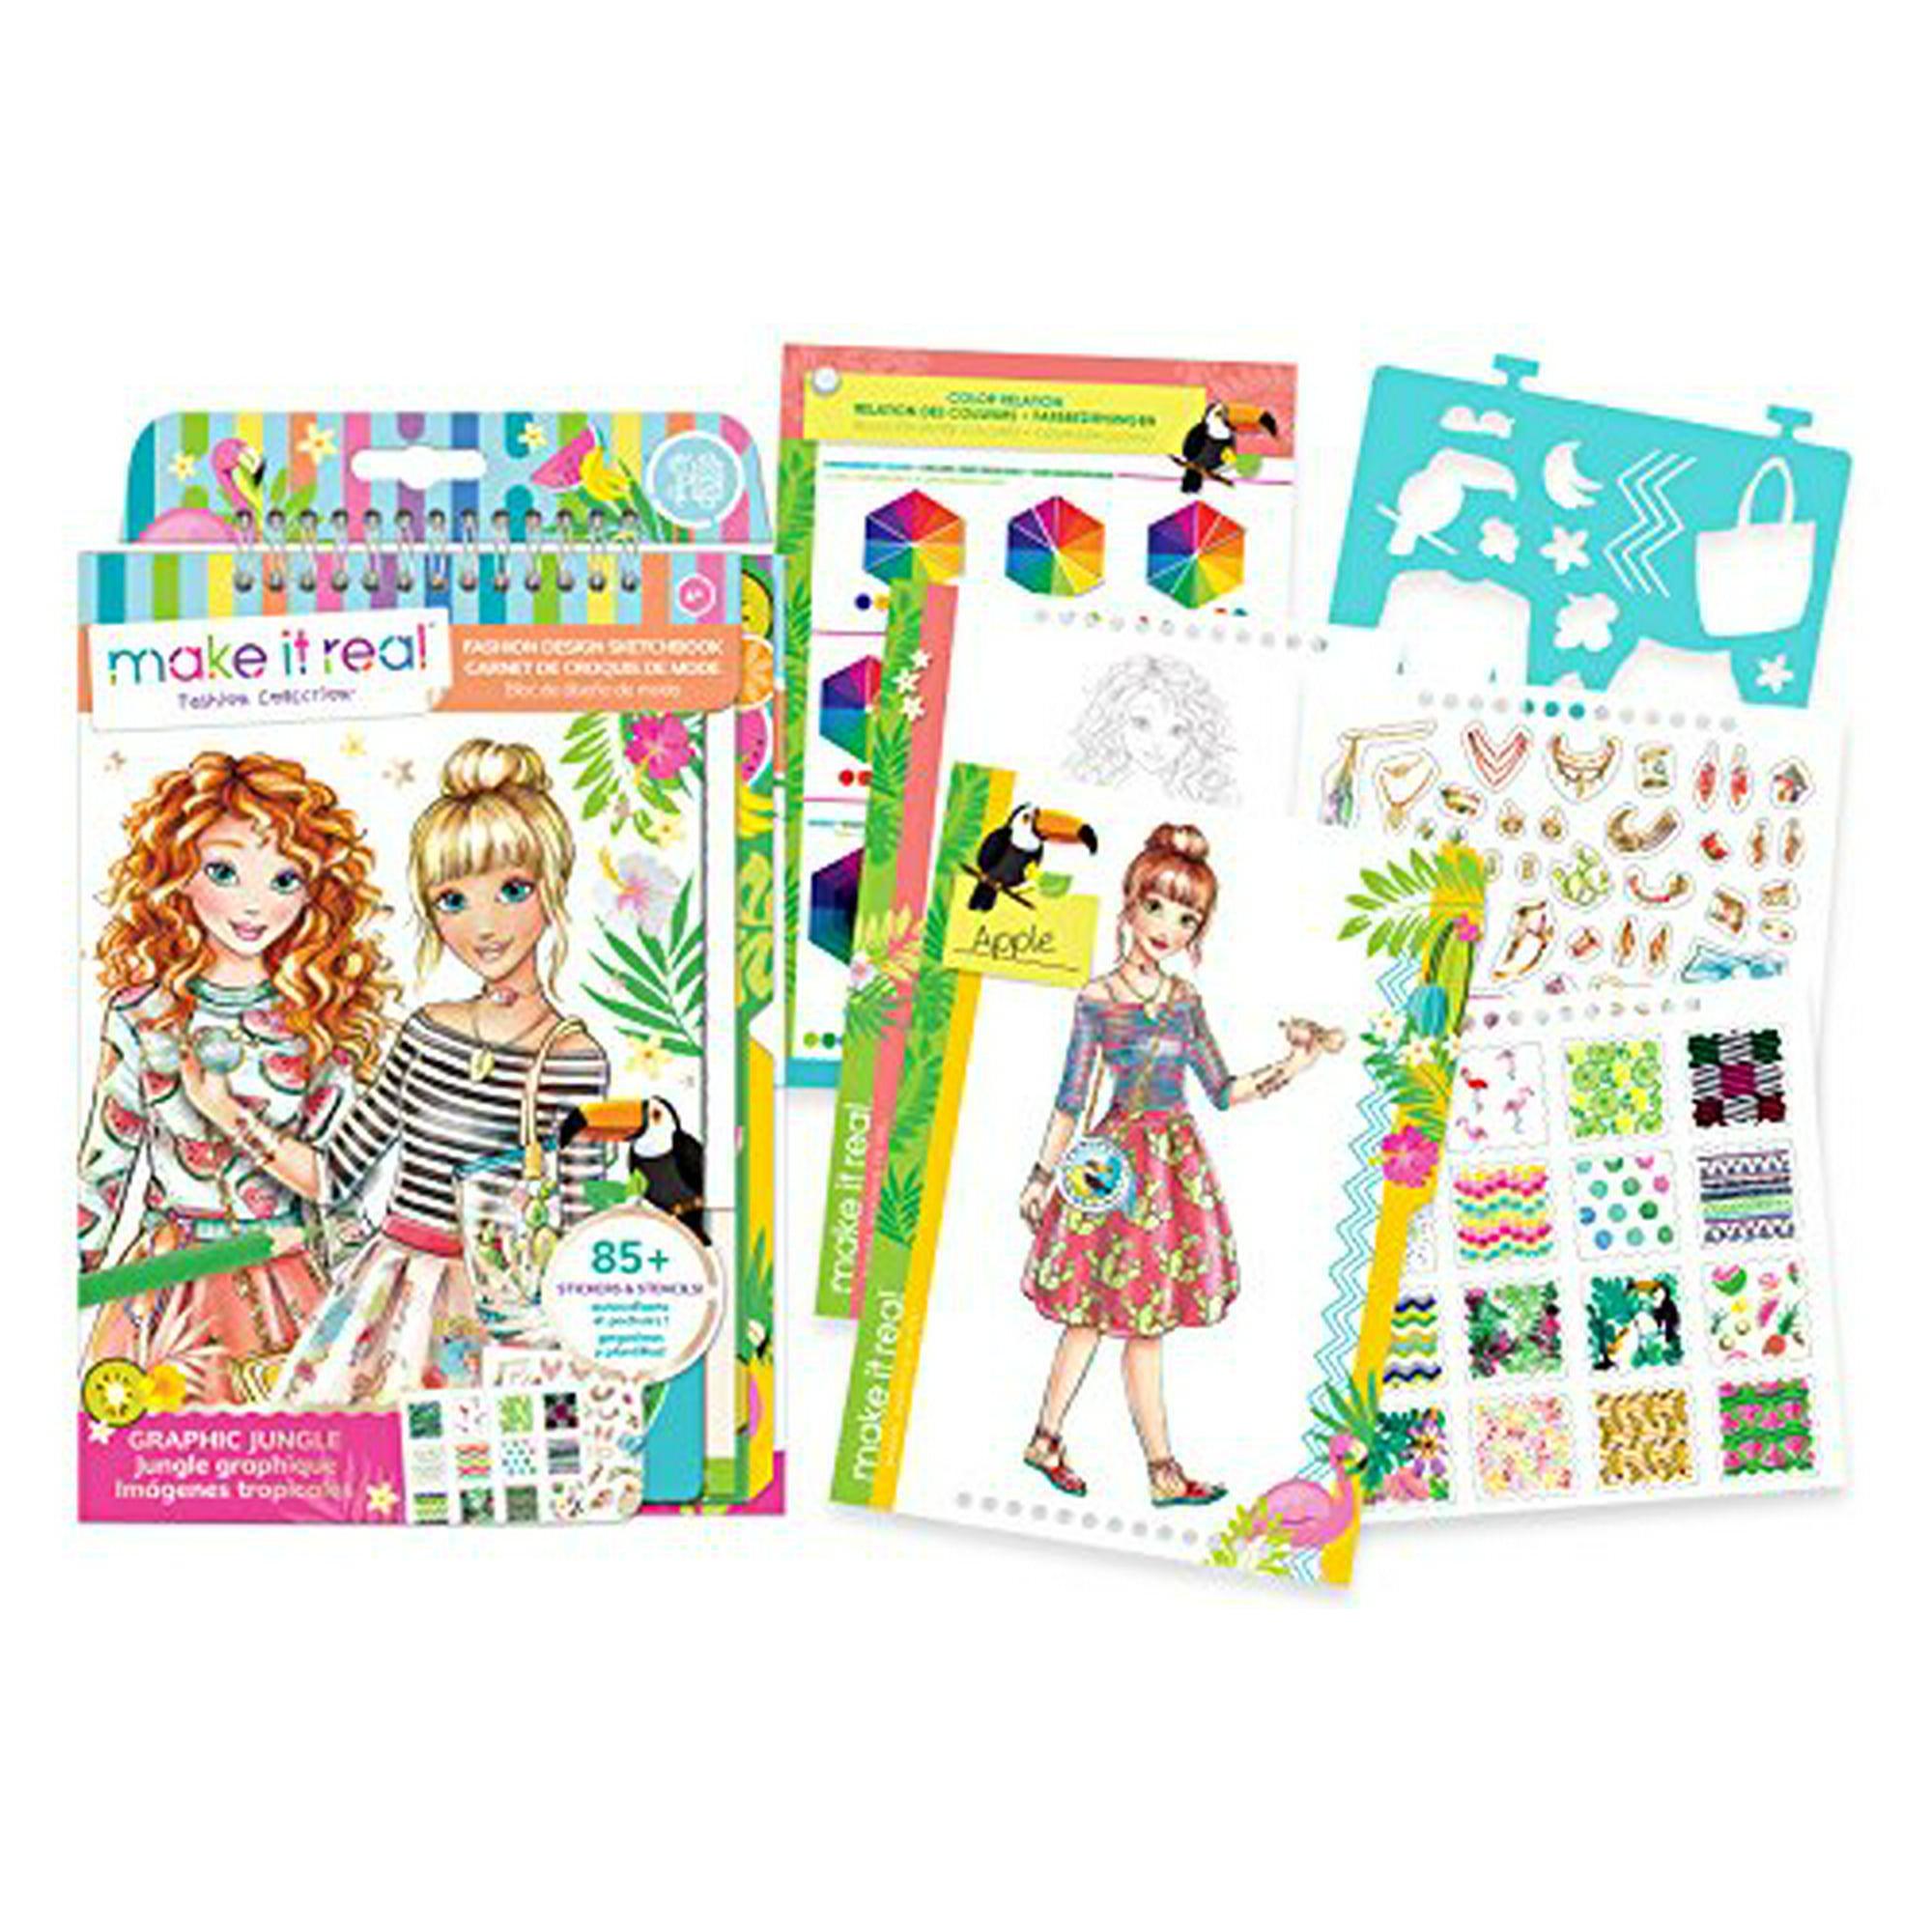 Make It Real A Fashion Design Sketchbook Graphic Jungle Inspirational Fashion Design Coloring Book For Girls Includes Sketchbook Stencils Puffy Stickers Foil Stickers And Fashion Design Gui Walmart Canada